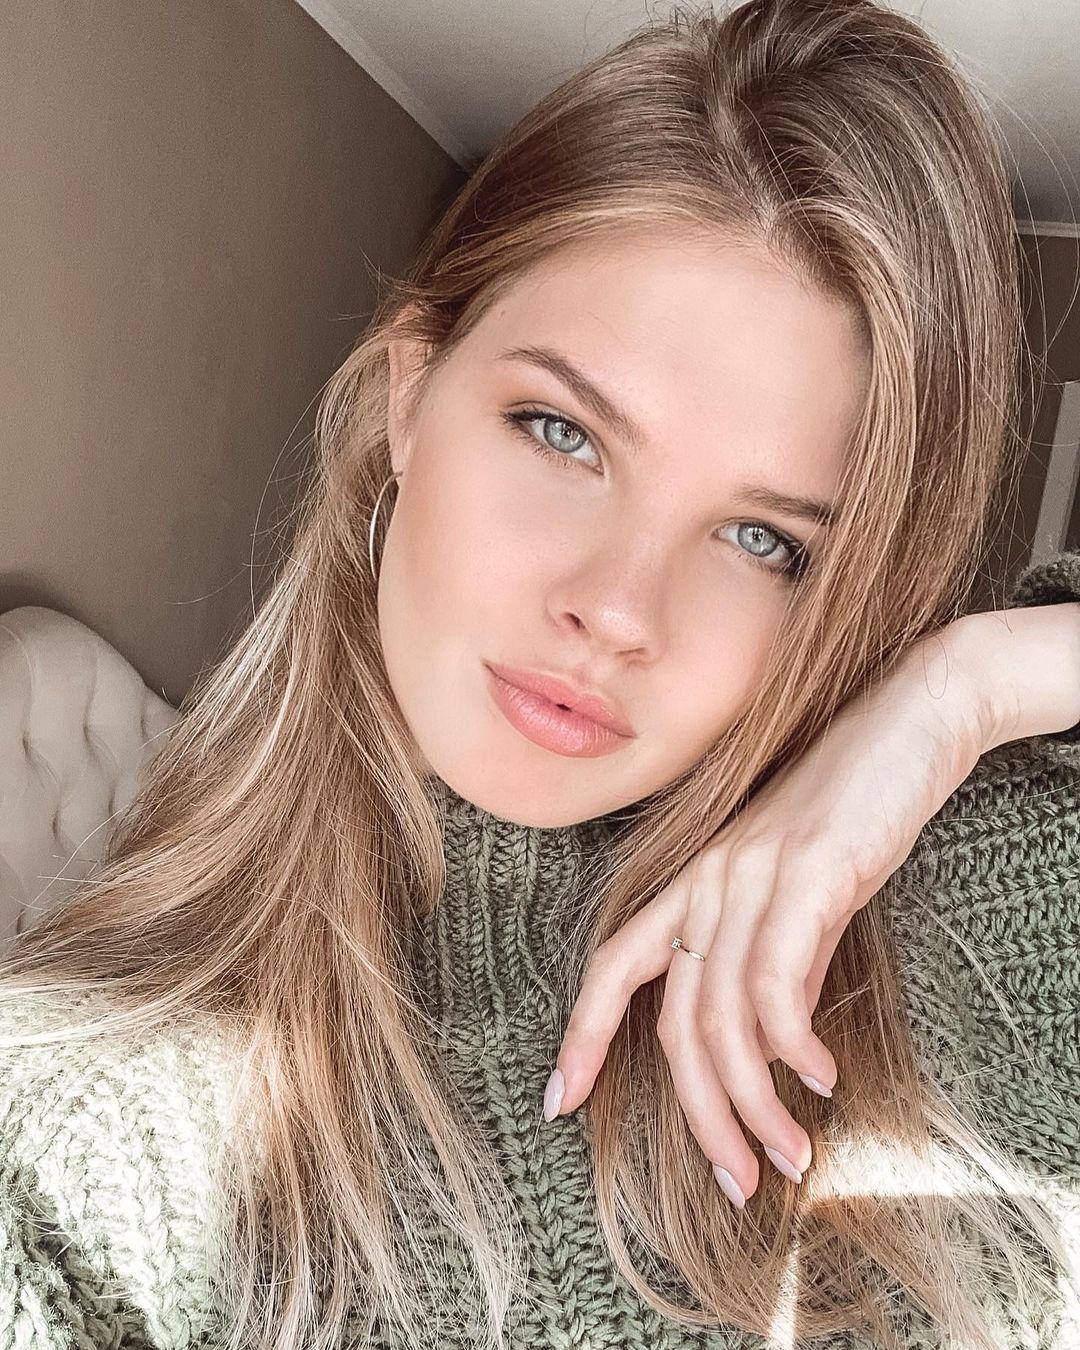 Mariia-Arsentieva-Wallpapers-Insta-Fit-Bio-13